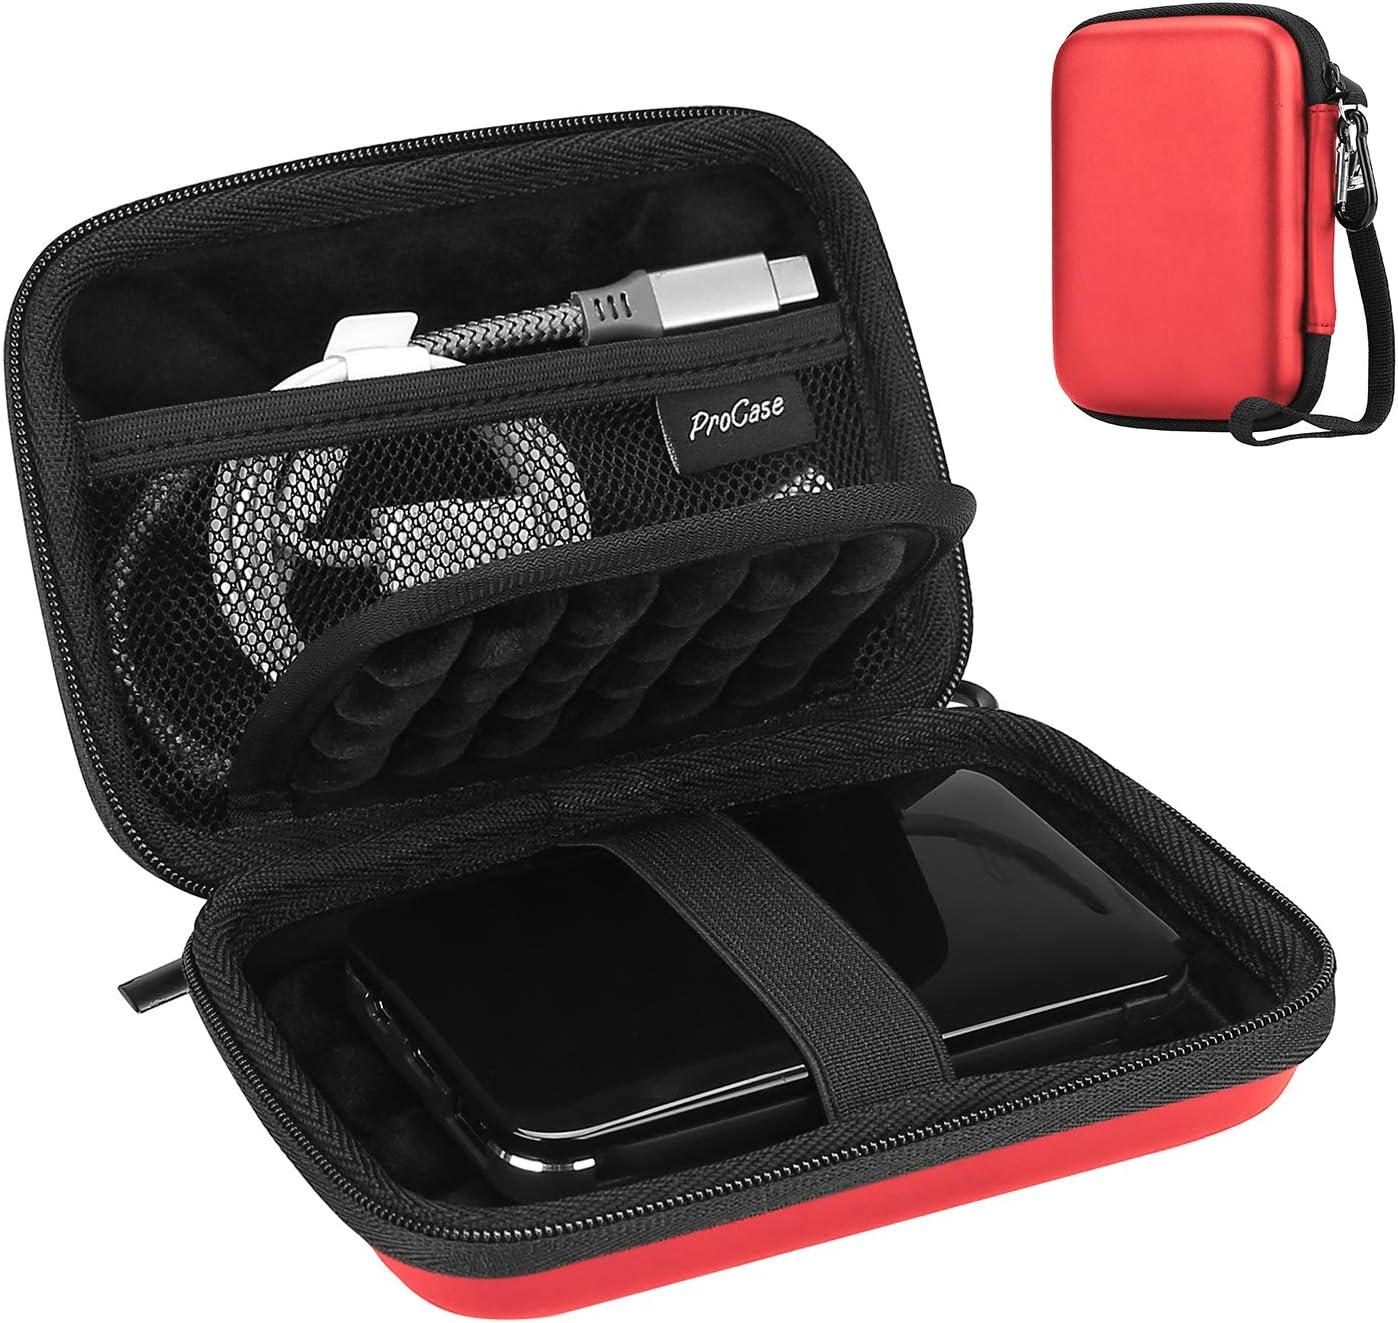 "ProCase Portable Hard Drive Case for Canvio Basics Western Digital WD Elements My Passport Seagate Portable Backup Plus Slim 1TB 2TB 3TB 4TB USB 3.0, 2.5"" Portable External Hard Drive Case -Red"